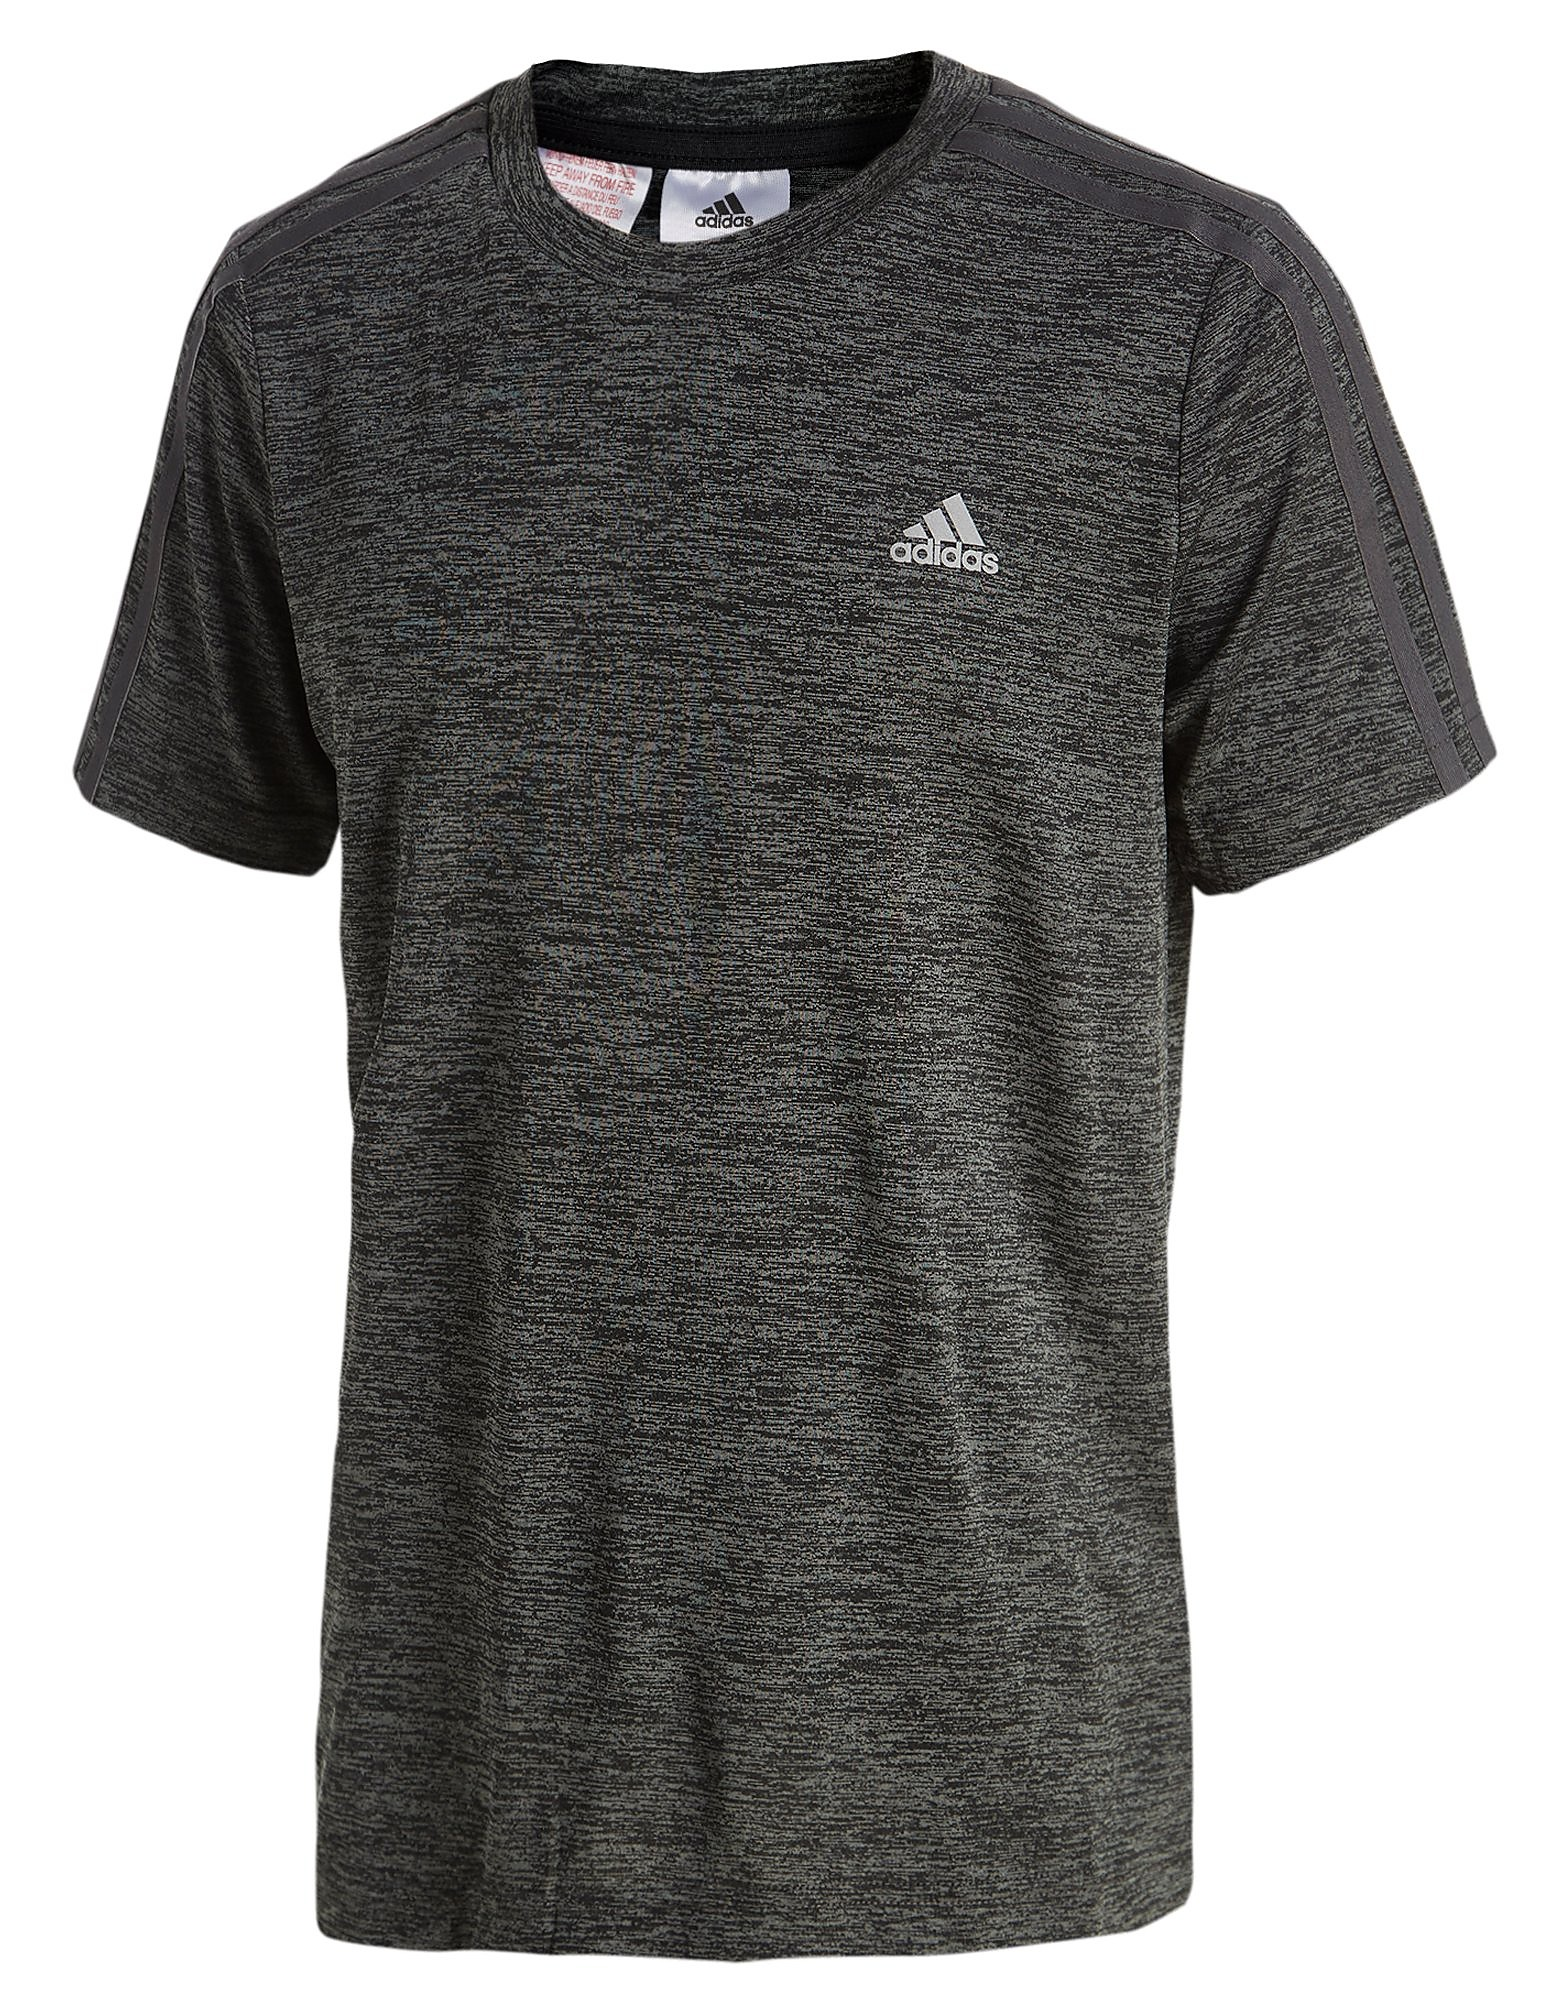 adidas Reflective T-Shirt